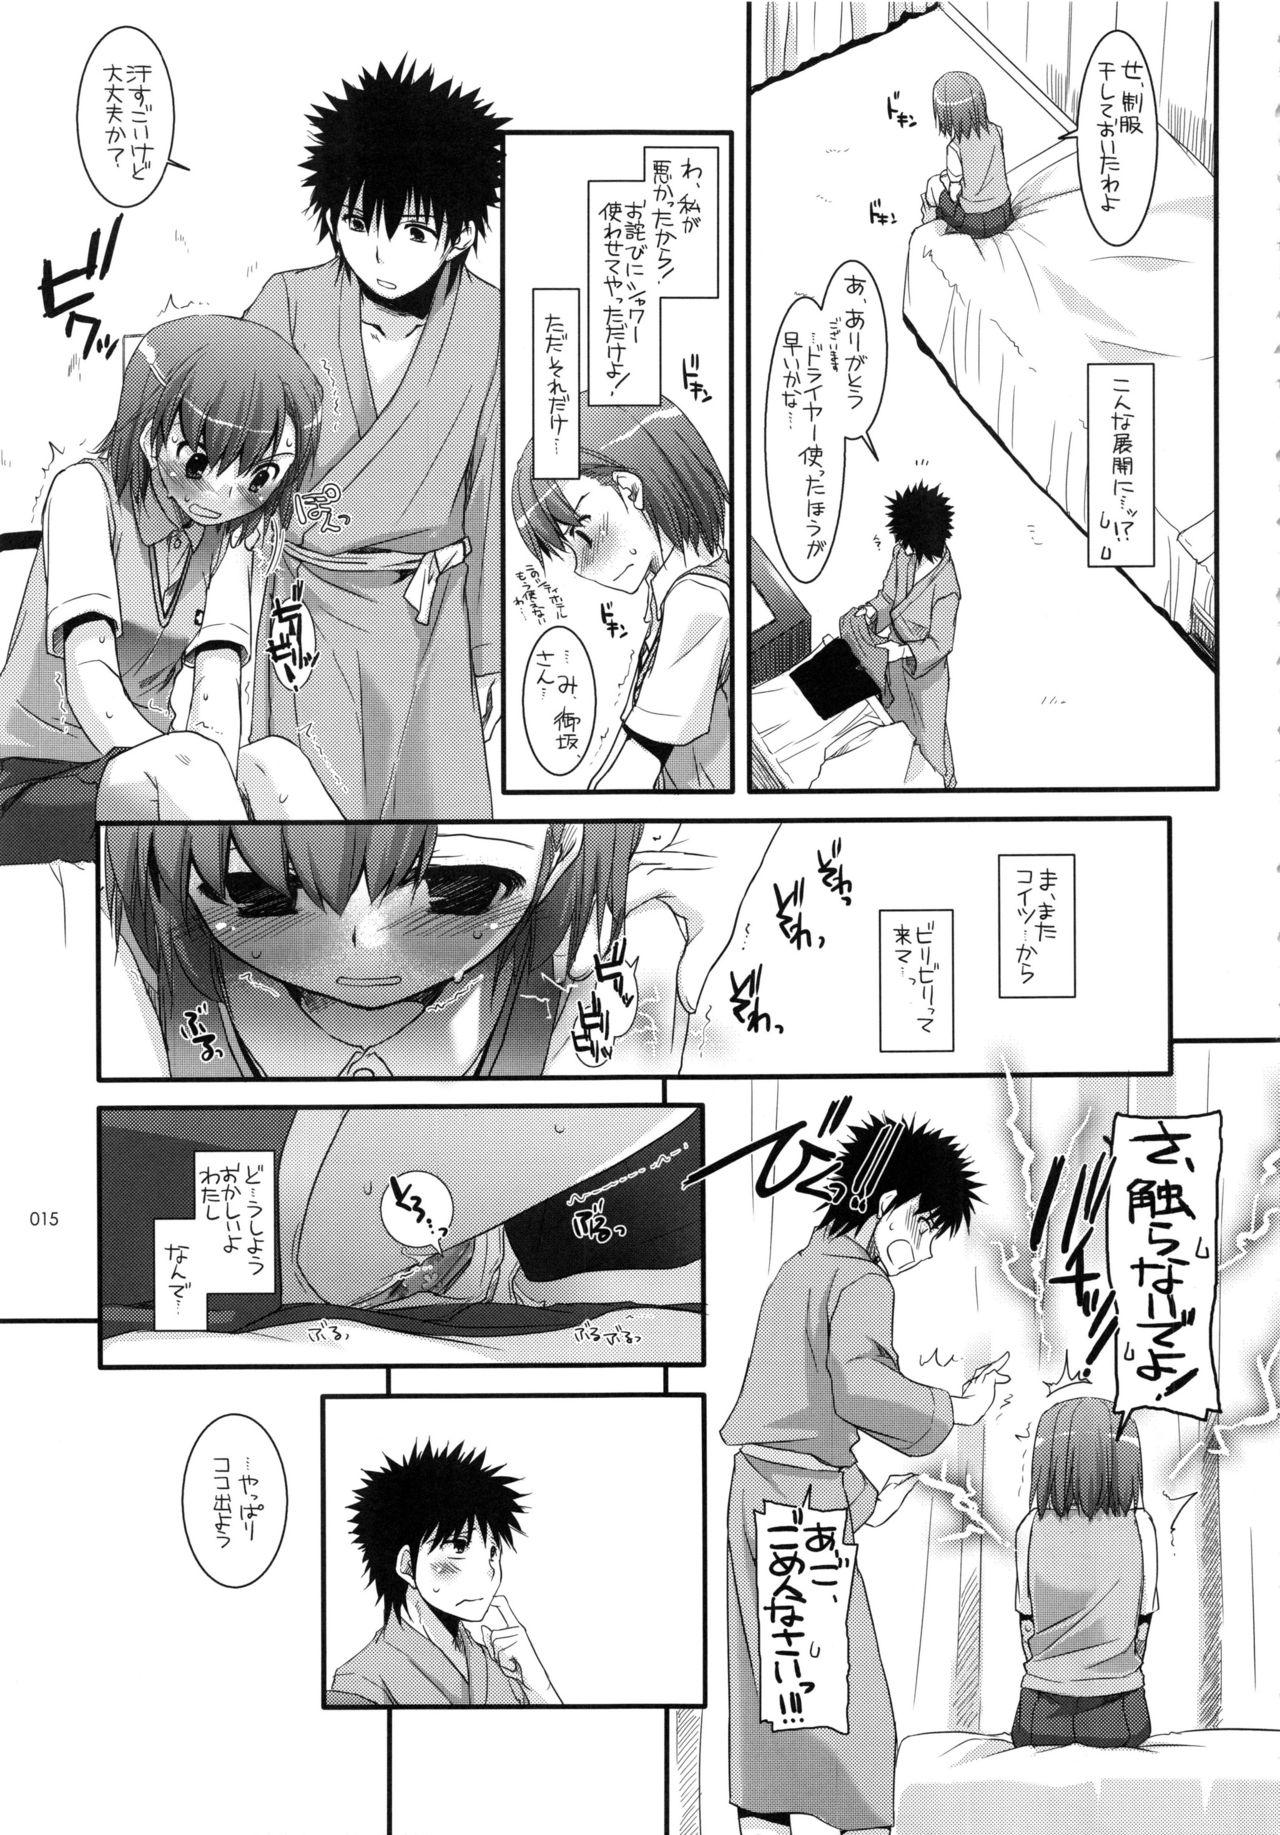 DL - Toaru Soushuuhen 13